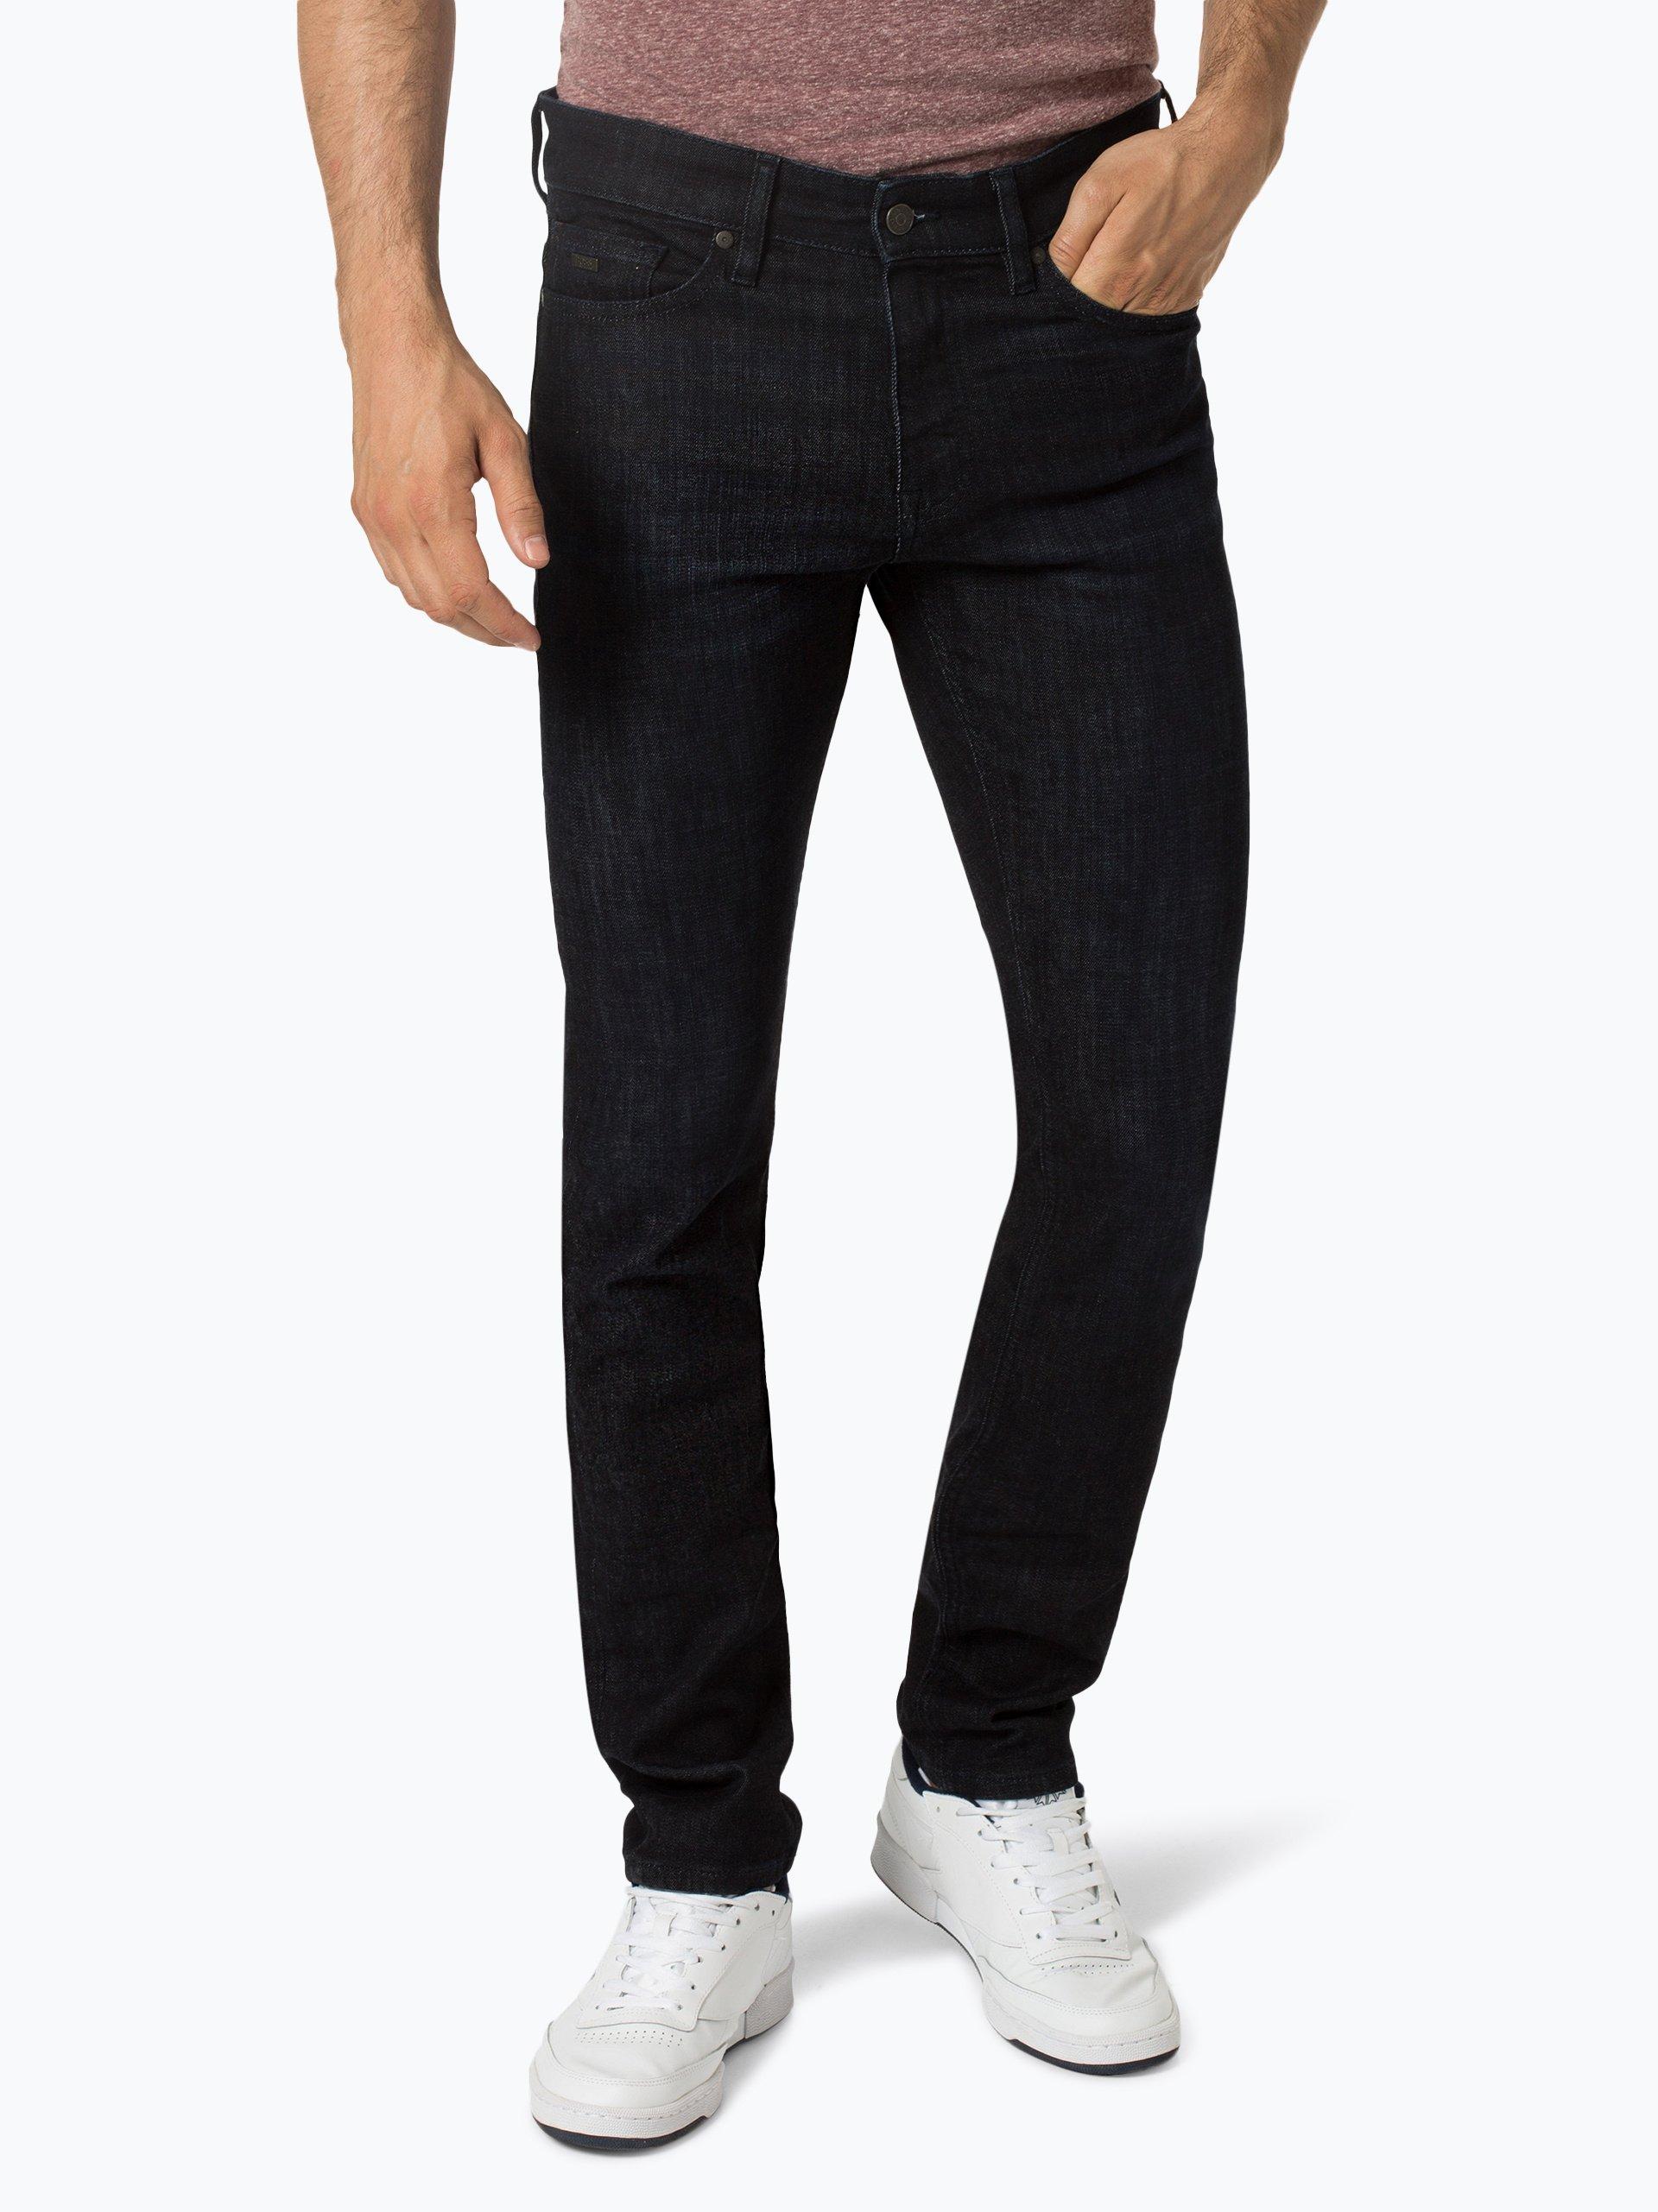 BOSS Casual Herren Jeans - Delaware BC-P